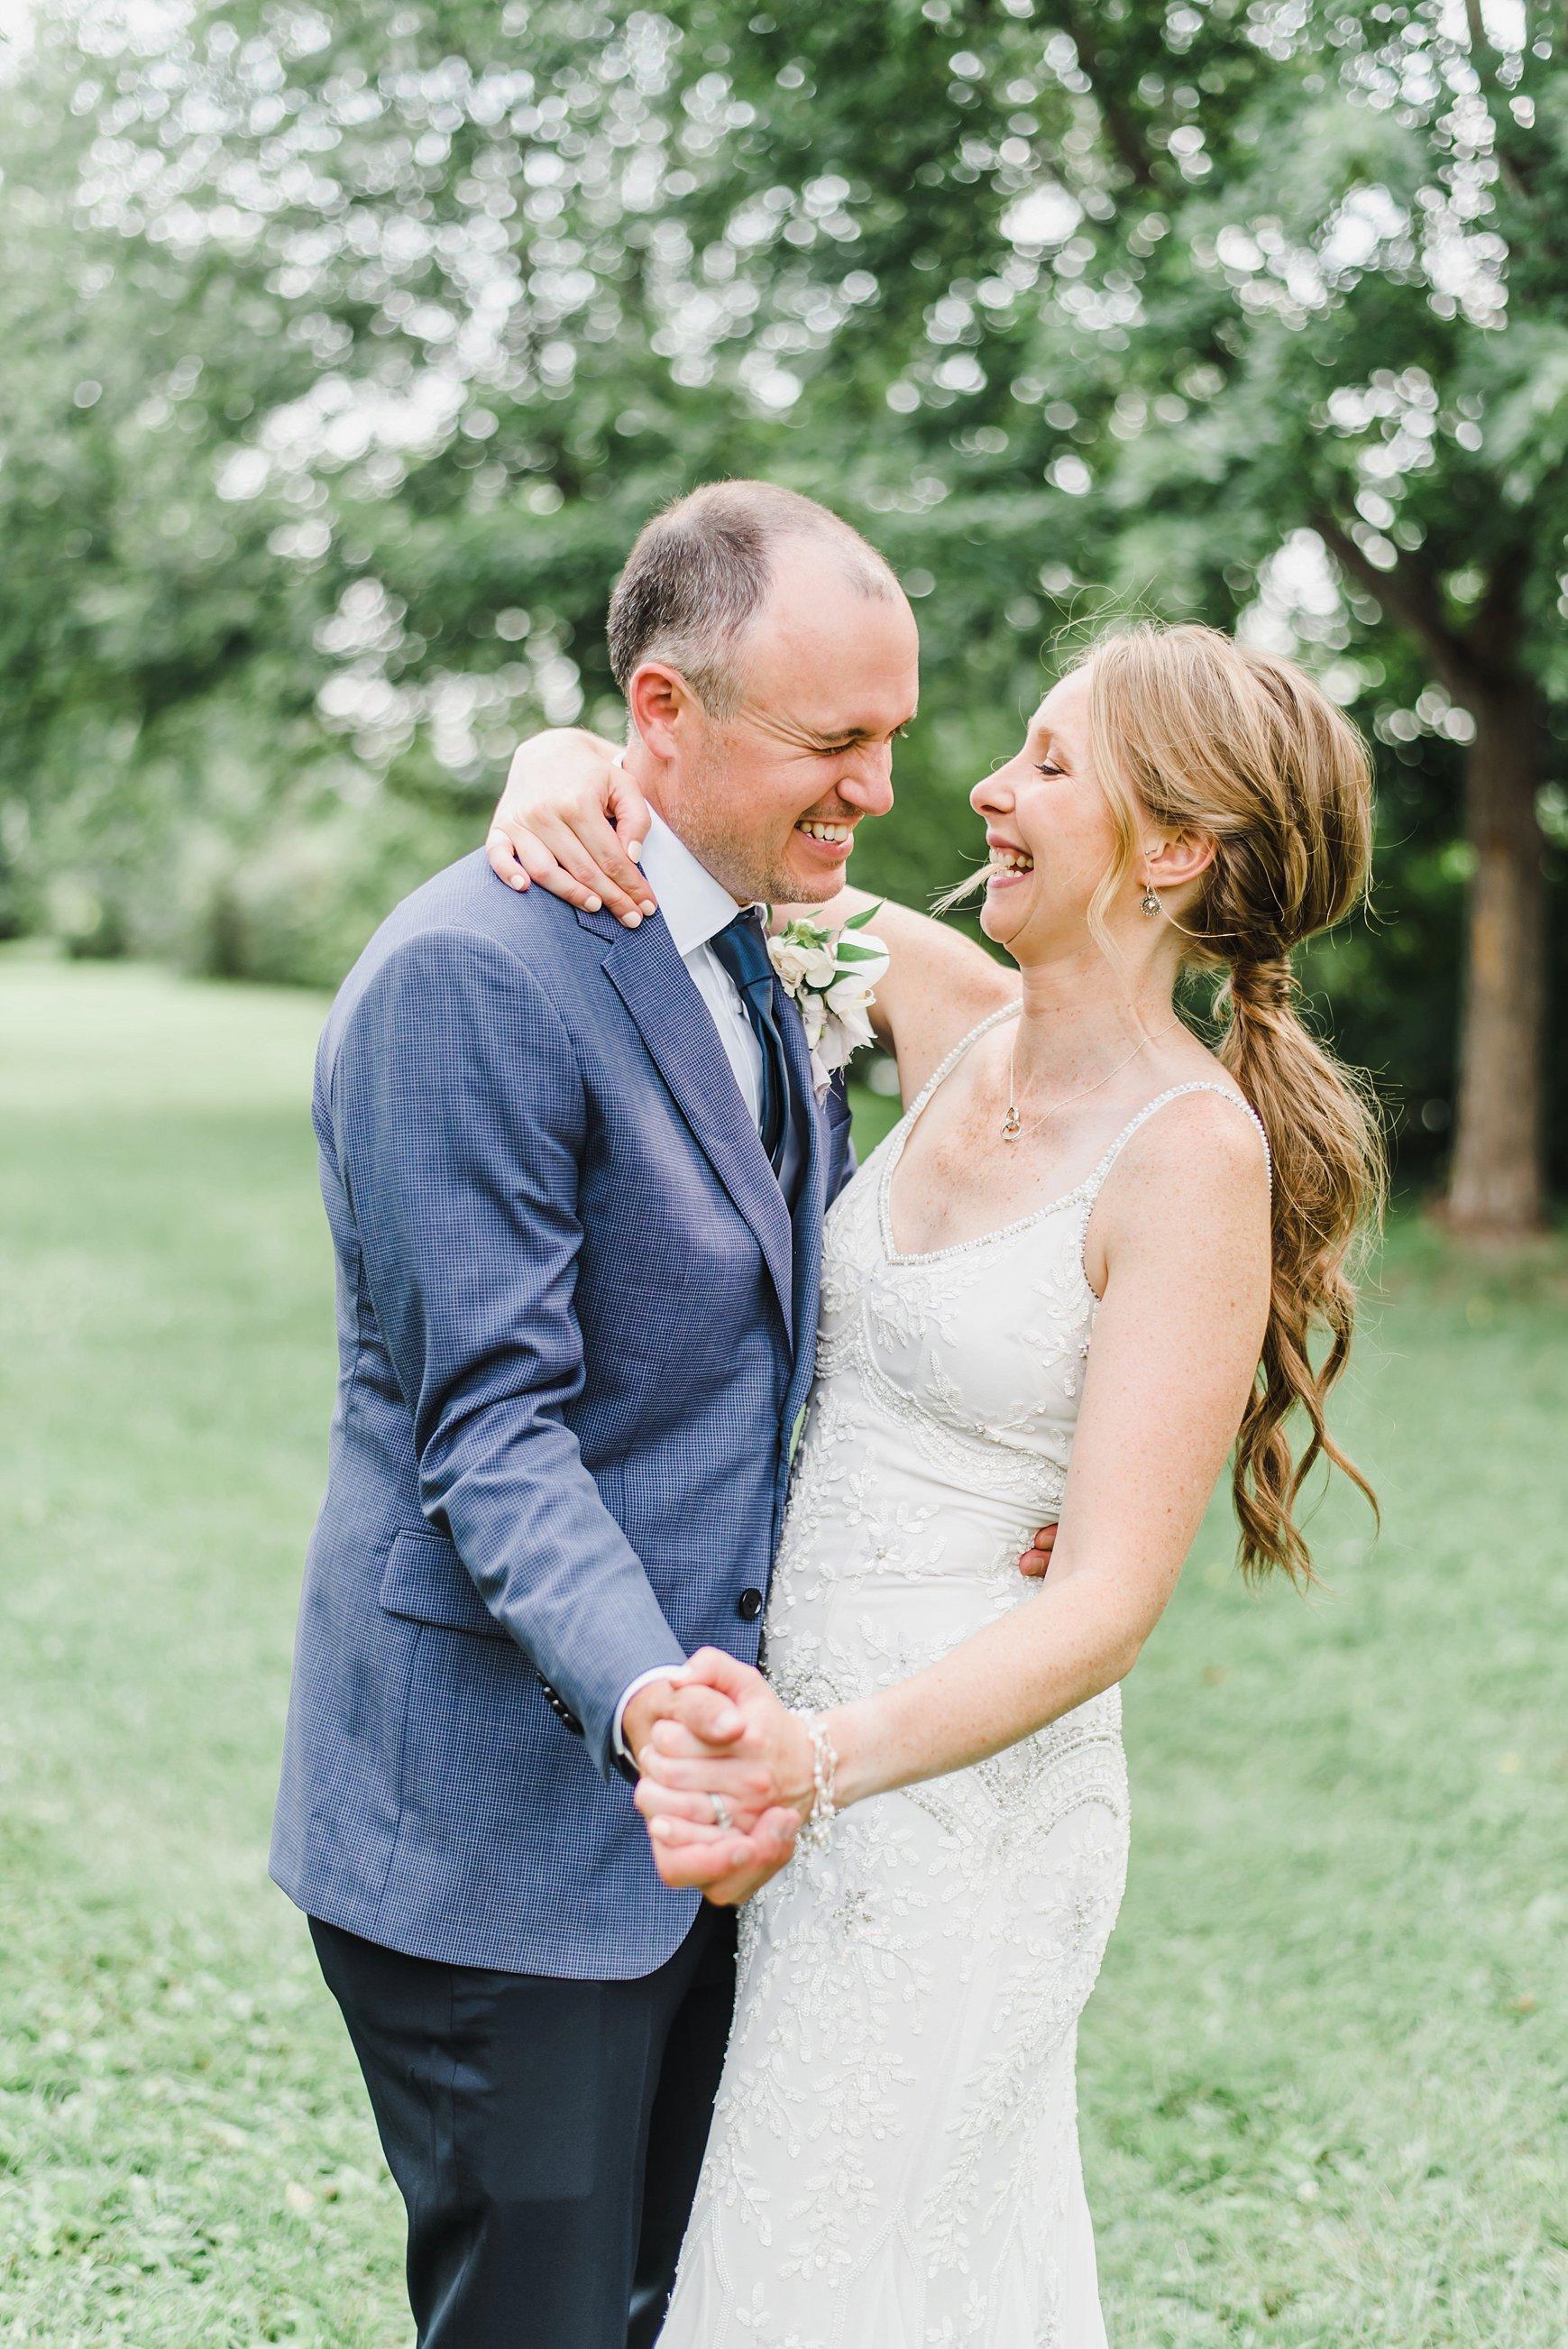 light airy indie fine art ottawa wedding photographer | Ali and Batoul Photography_0661.jpg